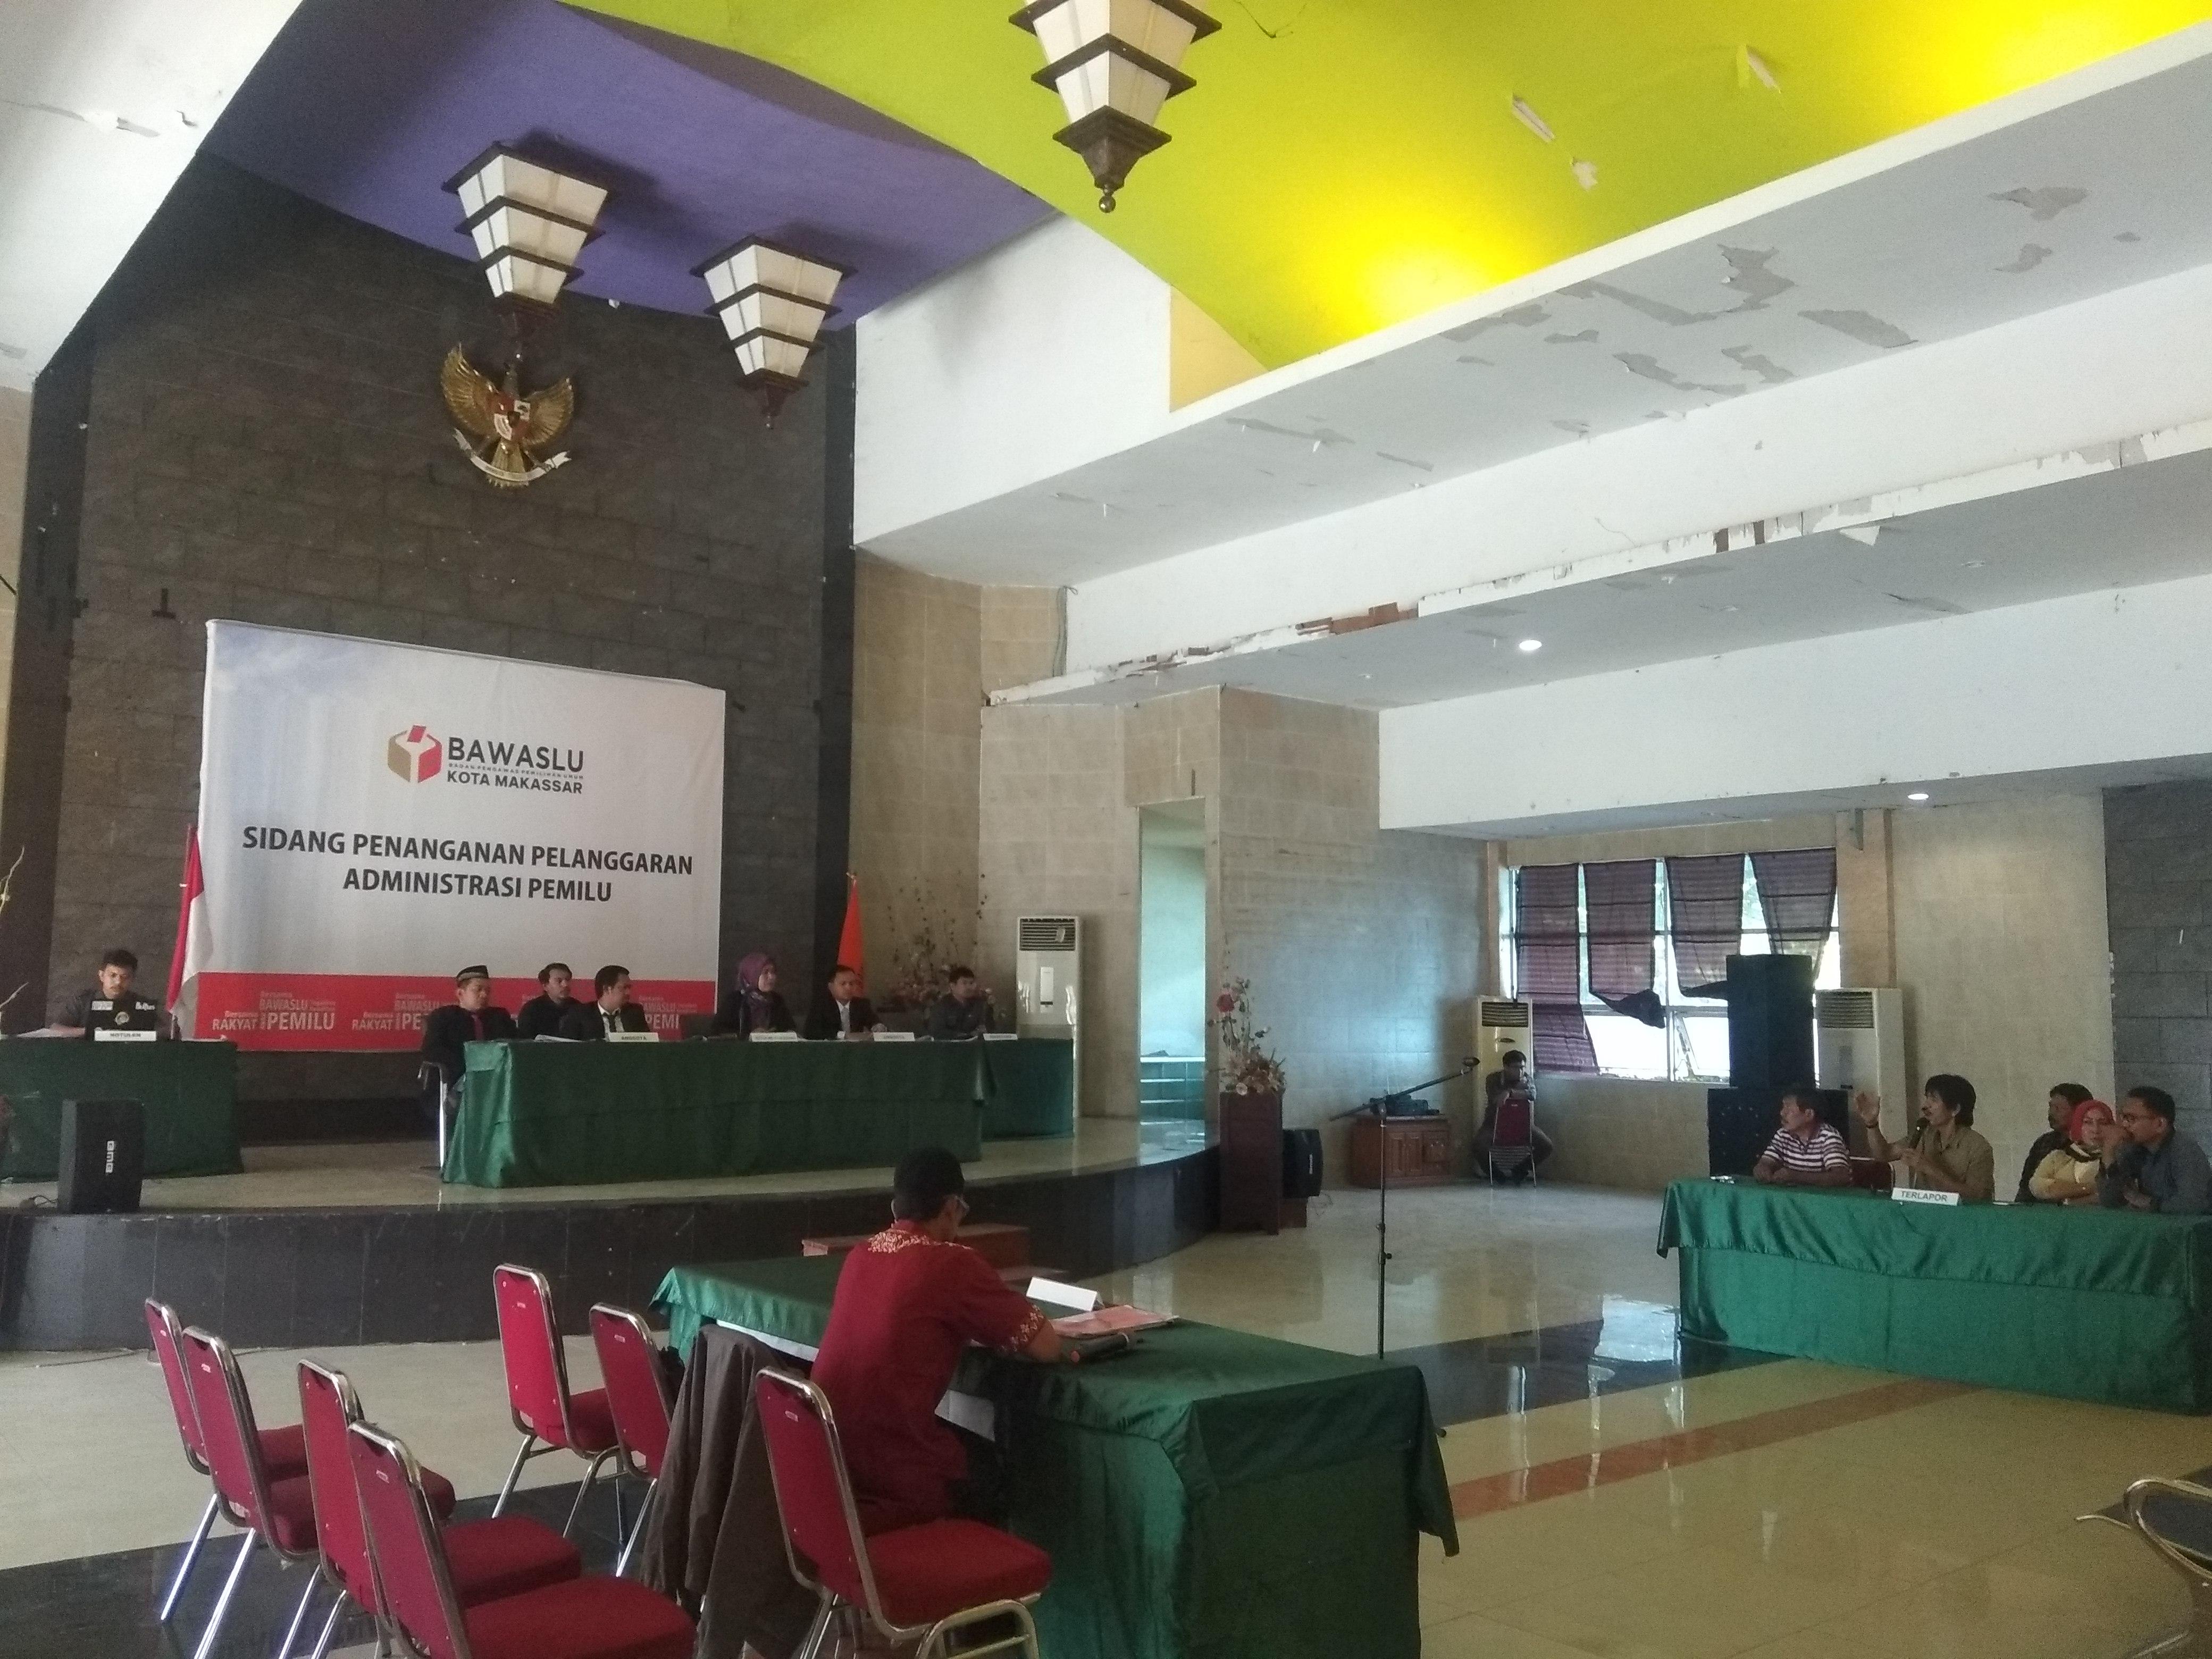 Terkait Dugaan Pelanggaran Admistrasi Pemilu, PPK Kecamatan Makassar disidang Bawaslu